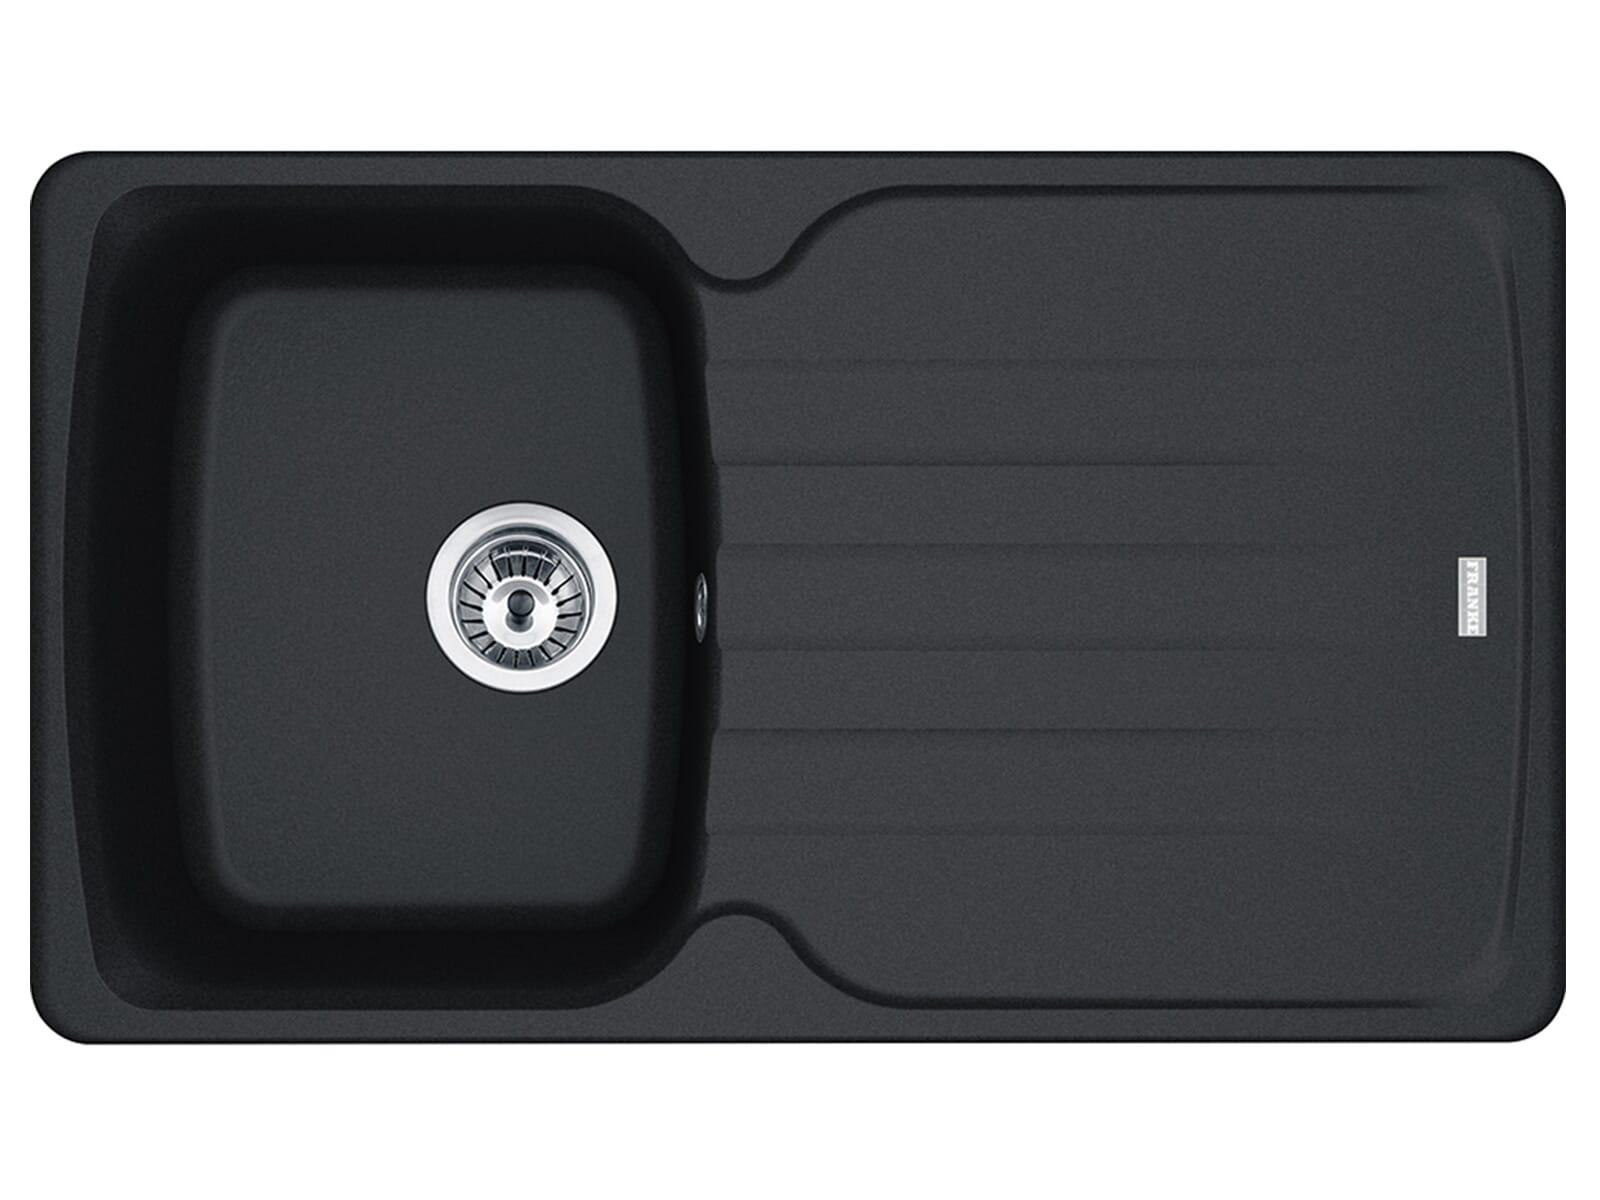 Franke Antea AZG 611 Onyx - 114.0477.978 Granitspüle Exzenterbetätigung